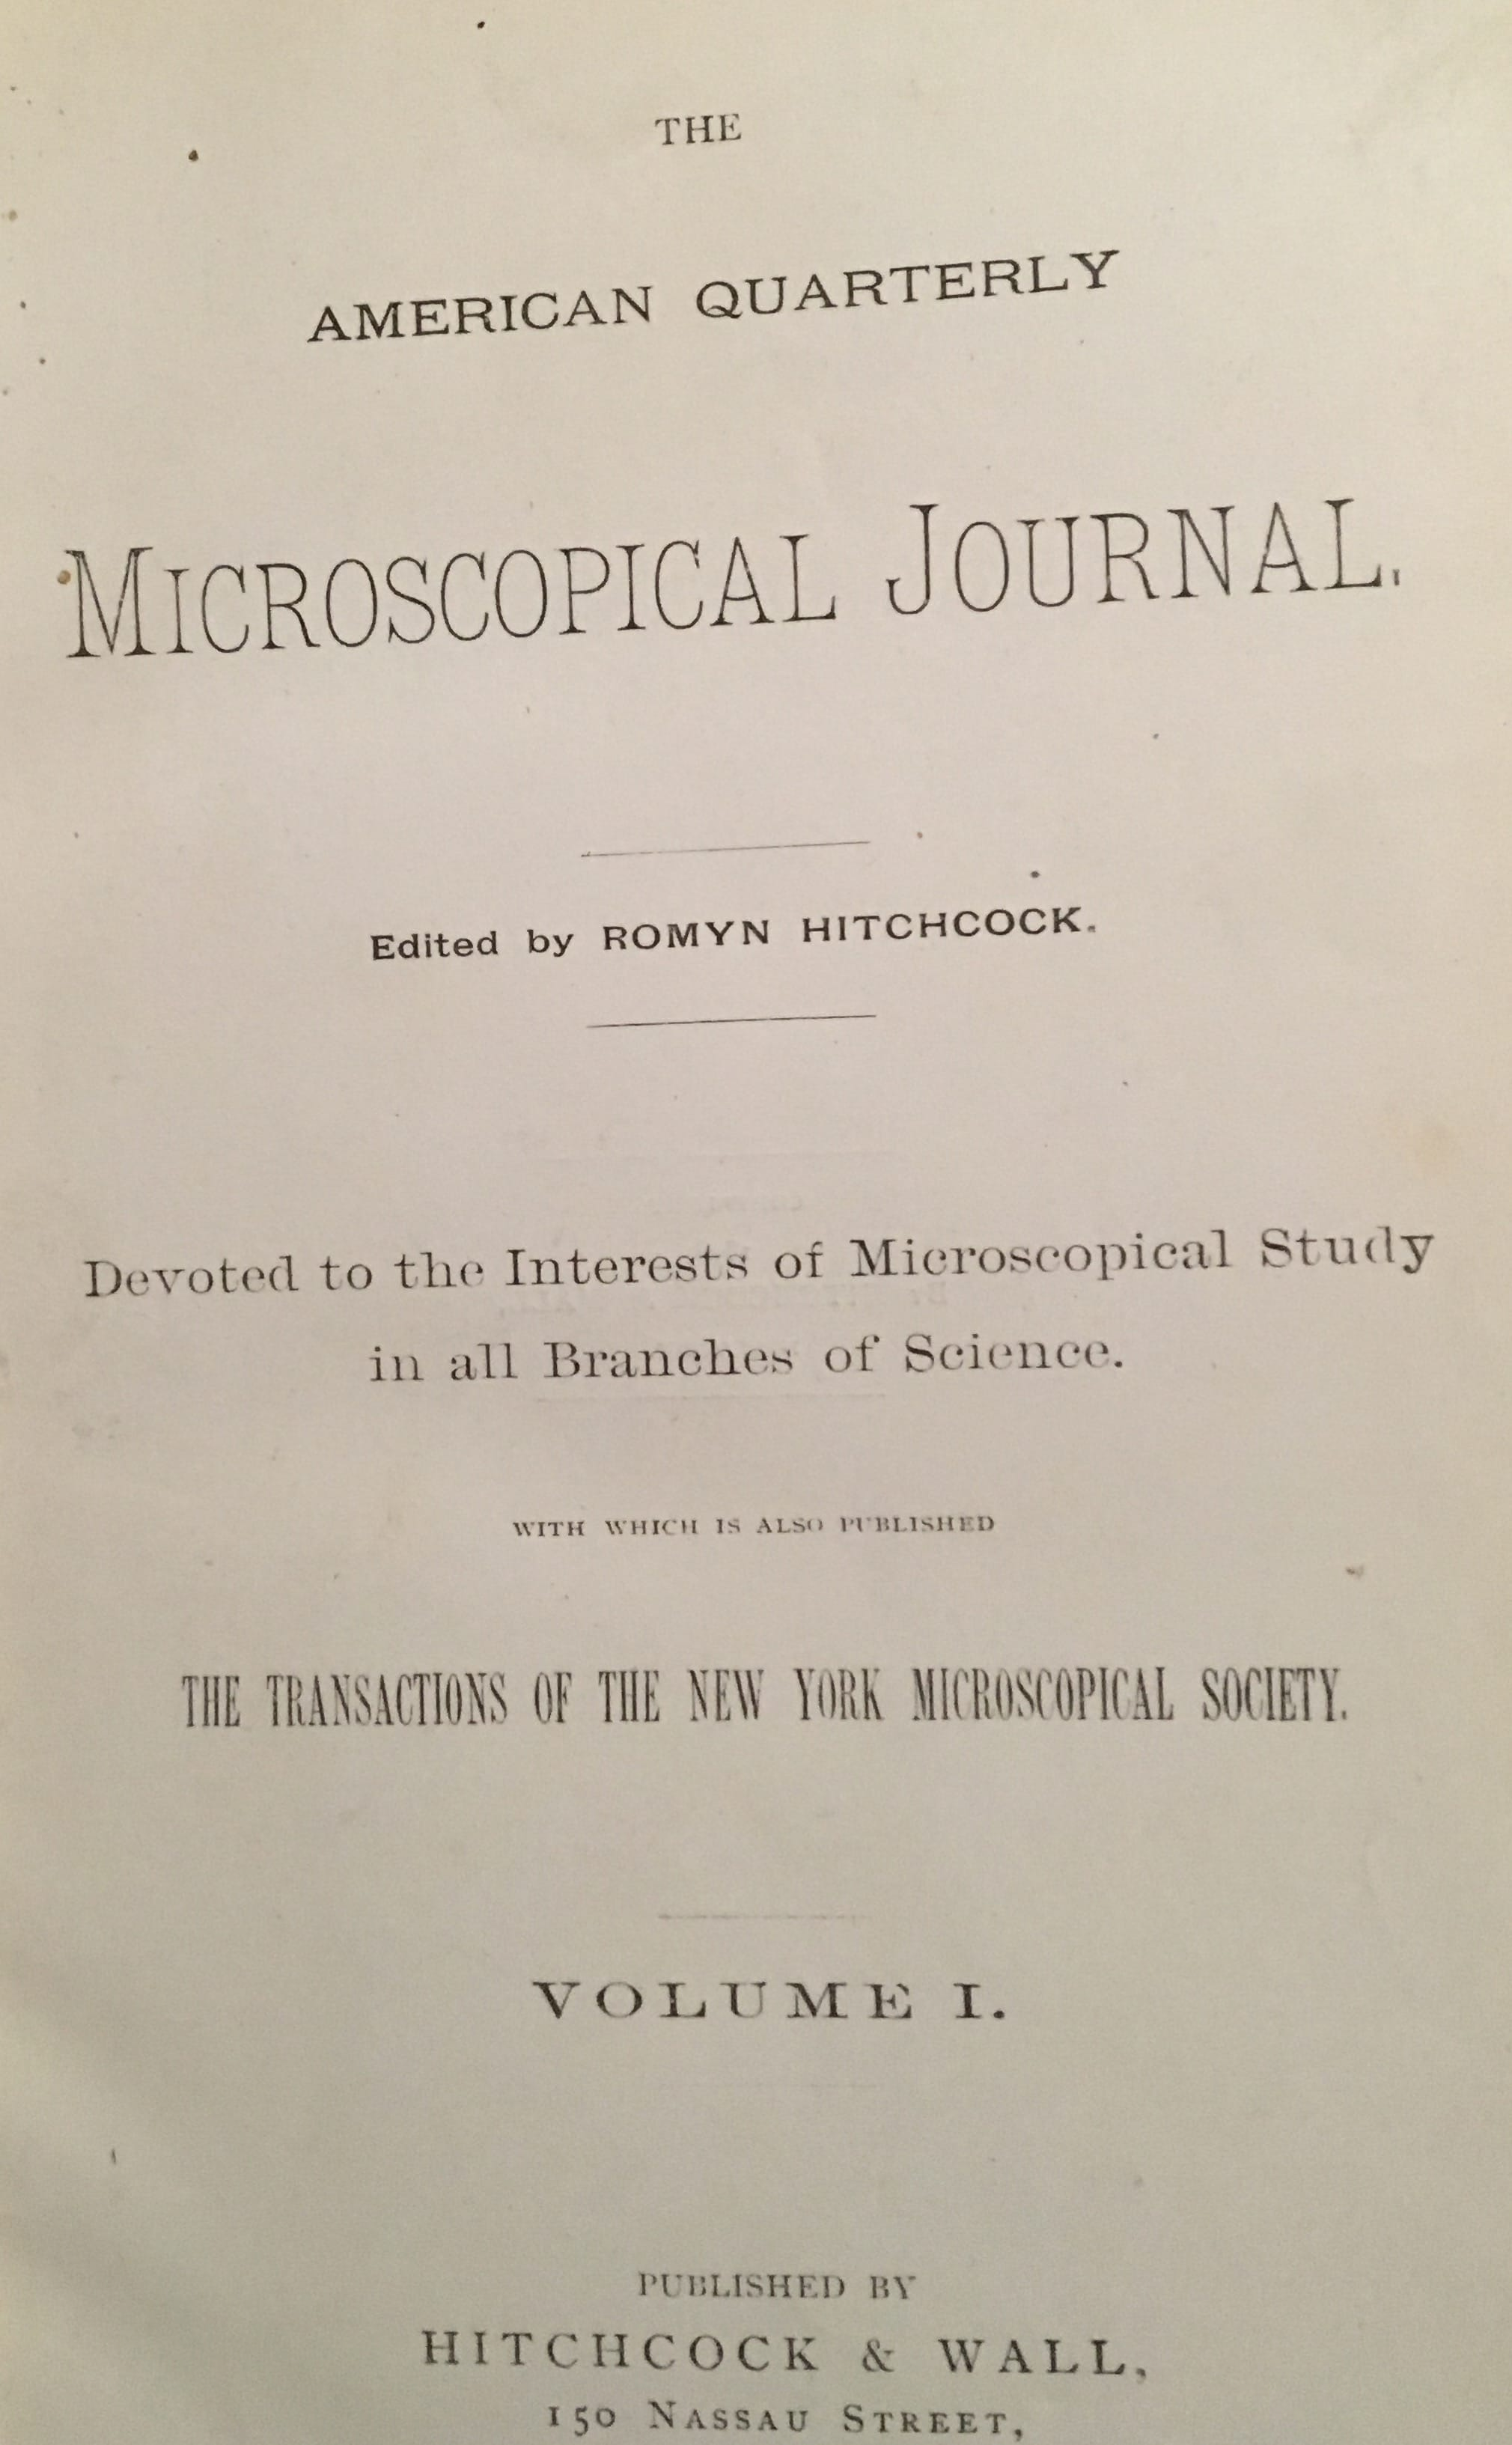 American Quarterly Microscopic Journal